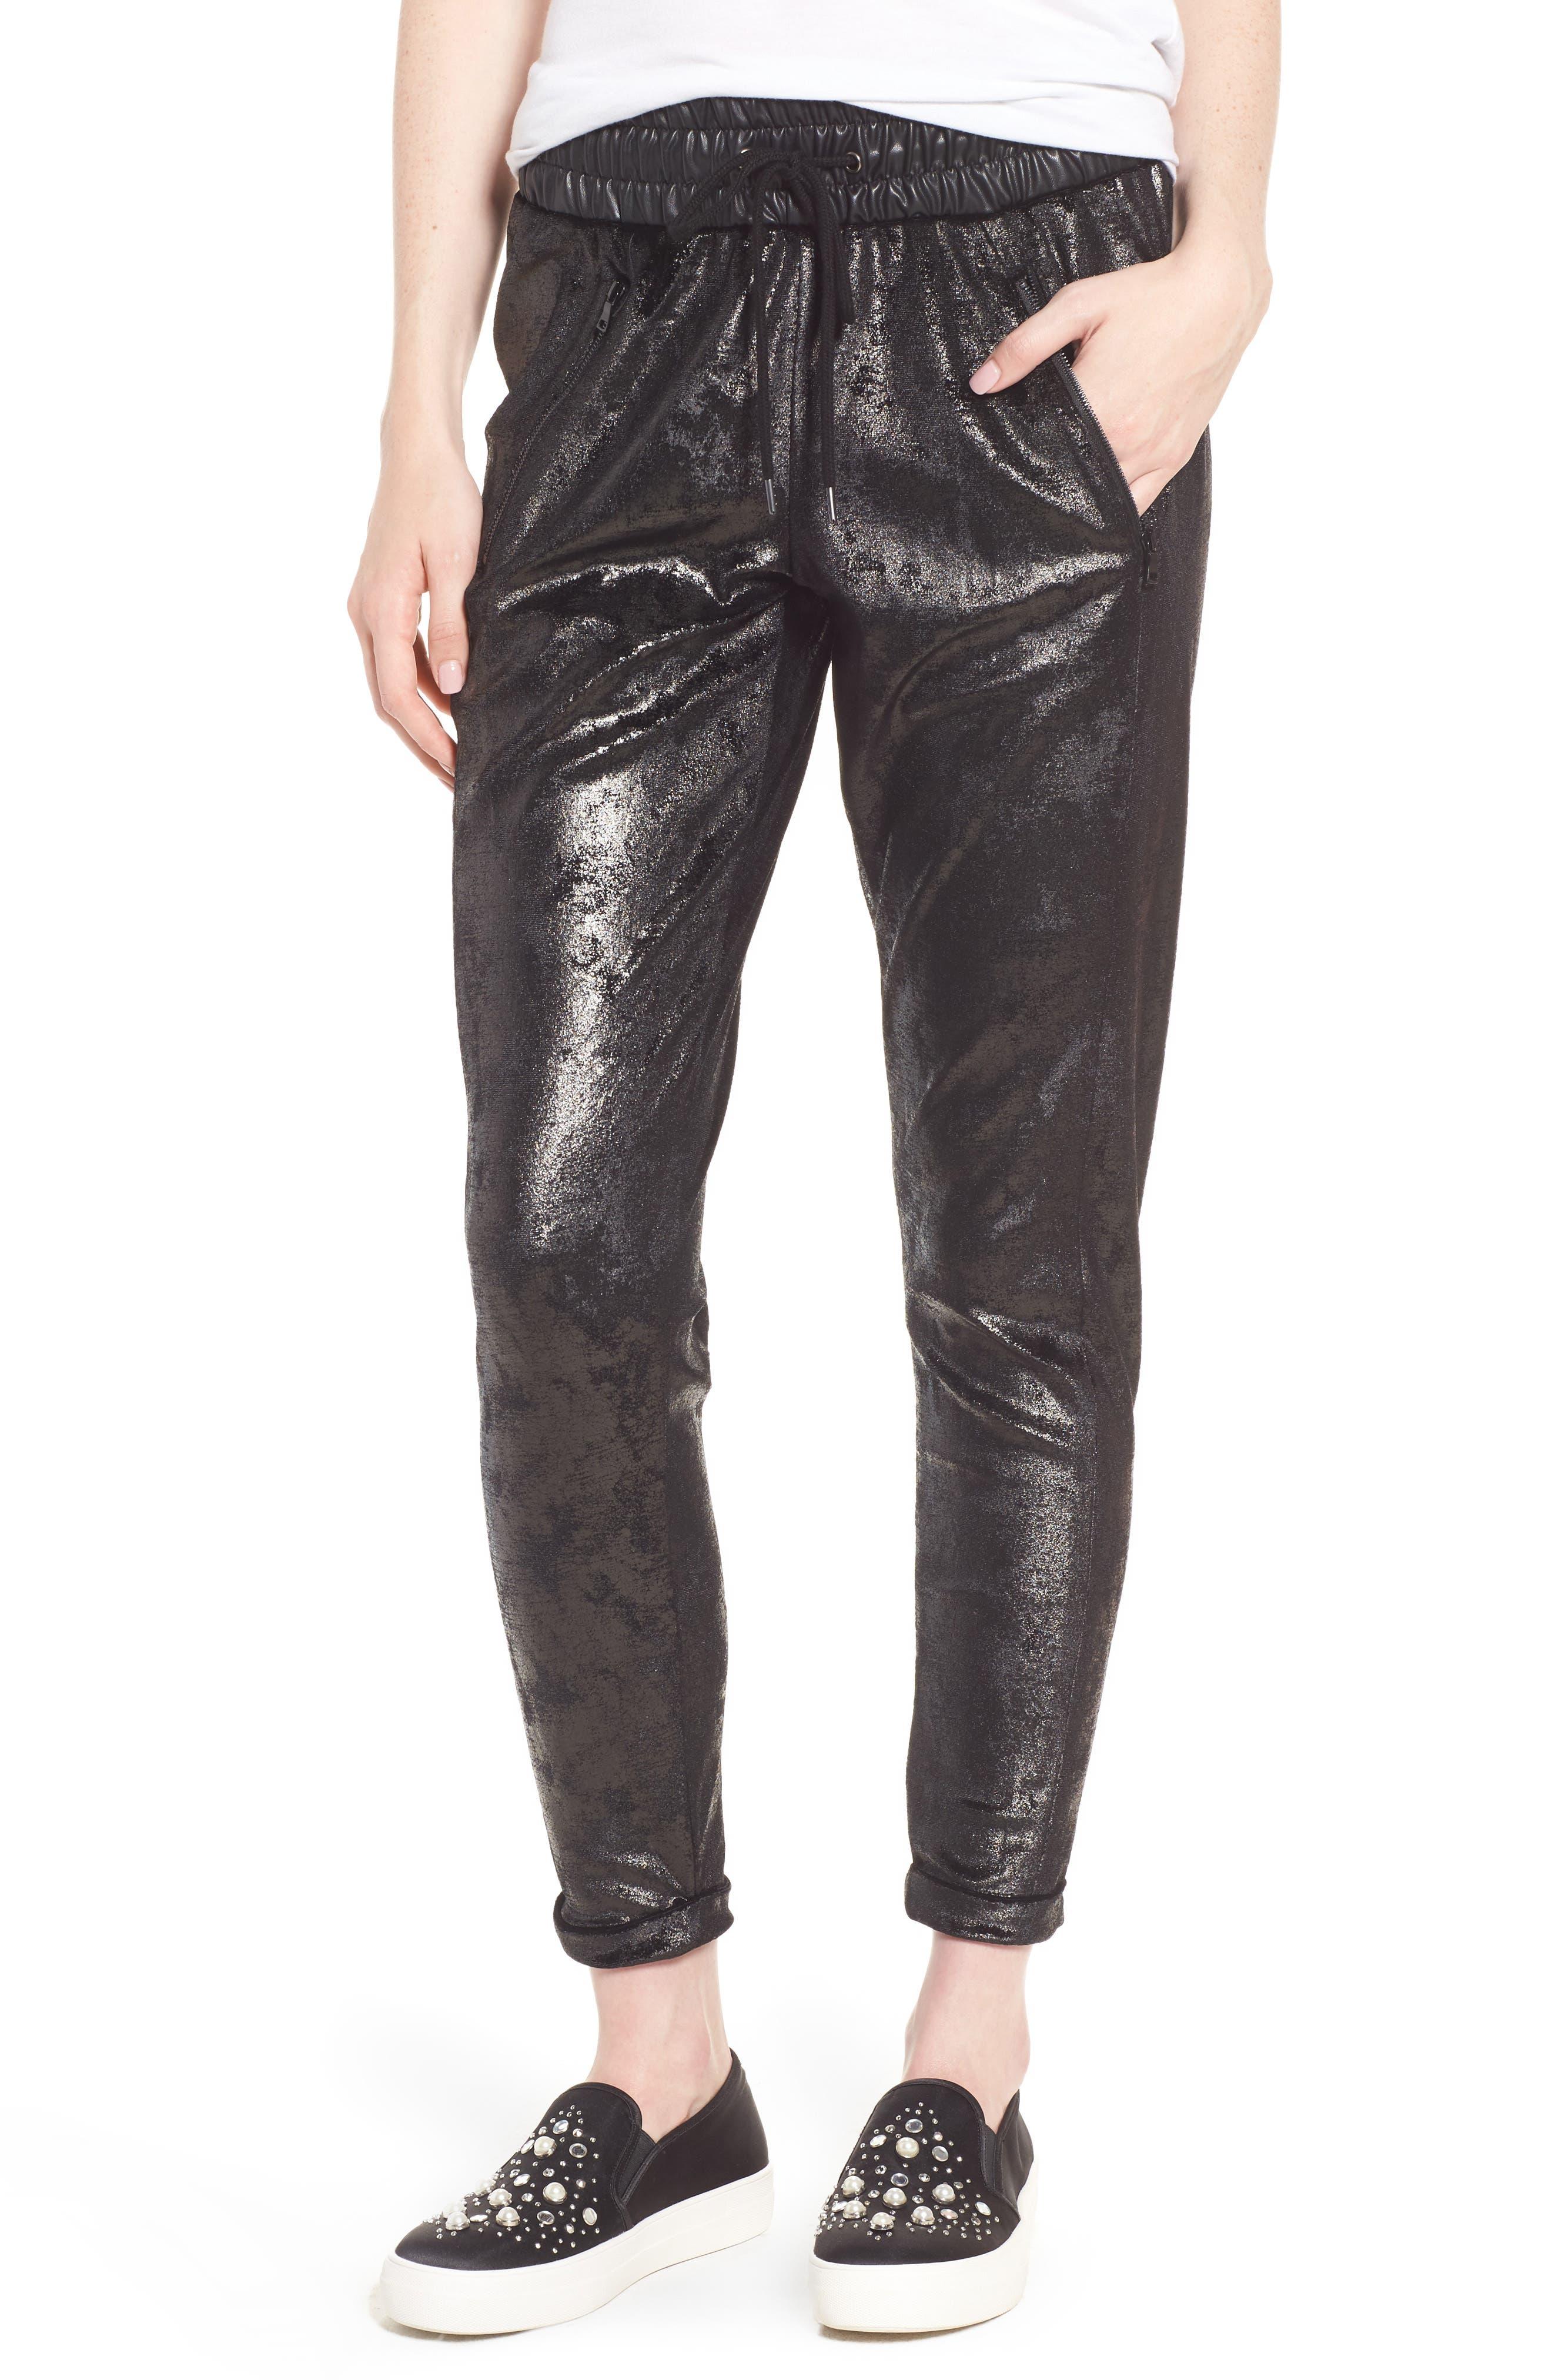 Randall Cuffed Sweatpants,                         Main,                         color, Black